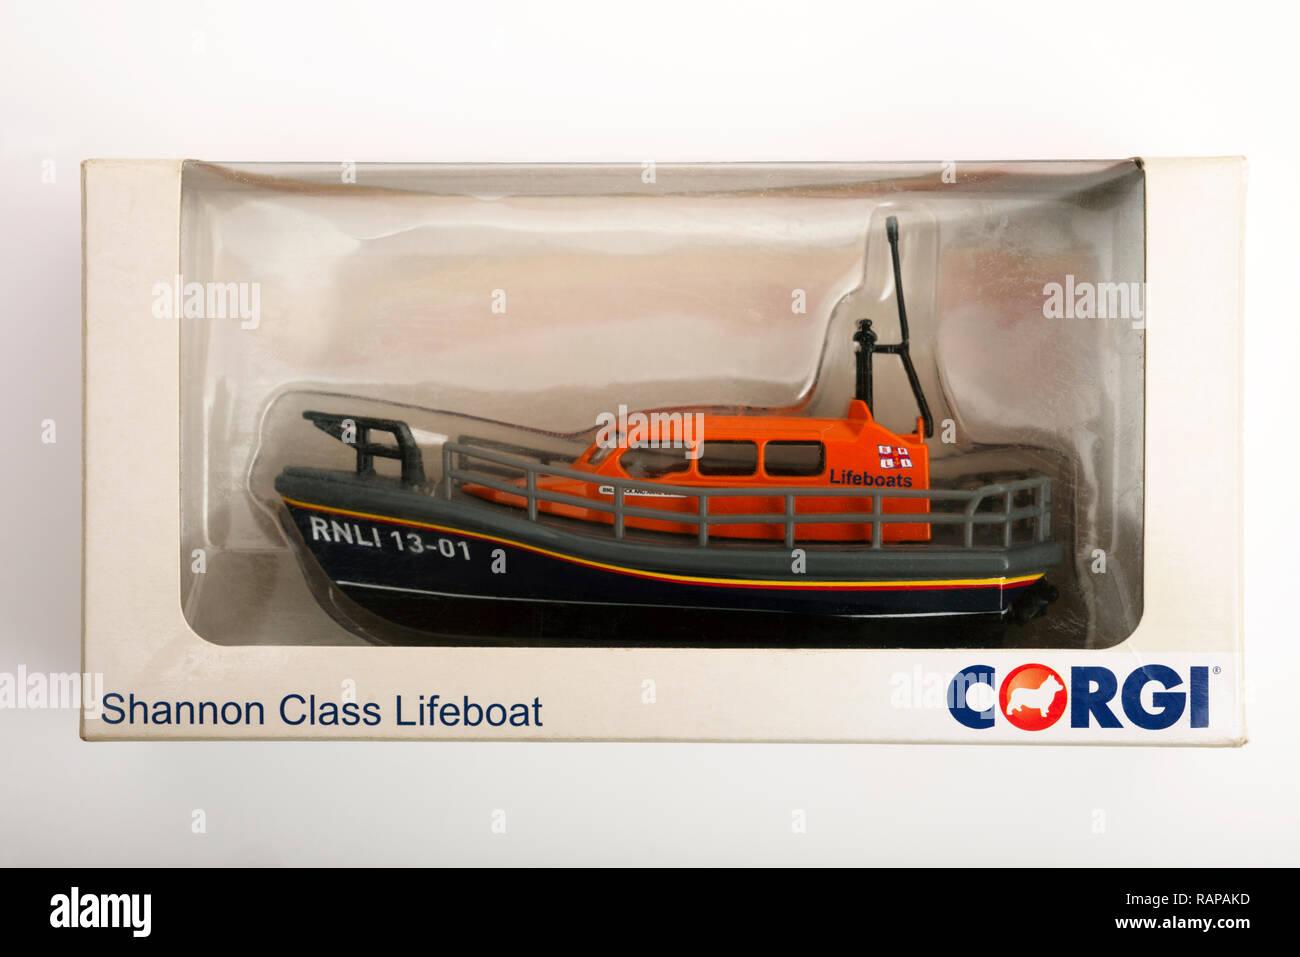 Corgi Shannon Class Lifeboat model - Stock Image